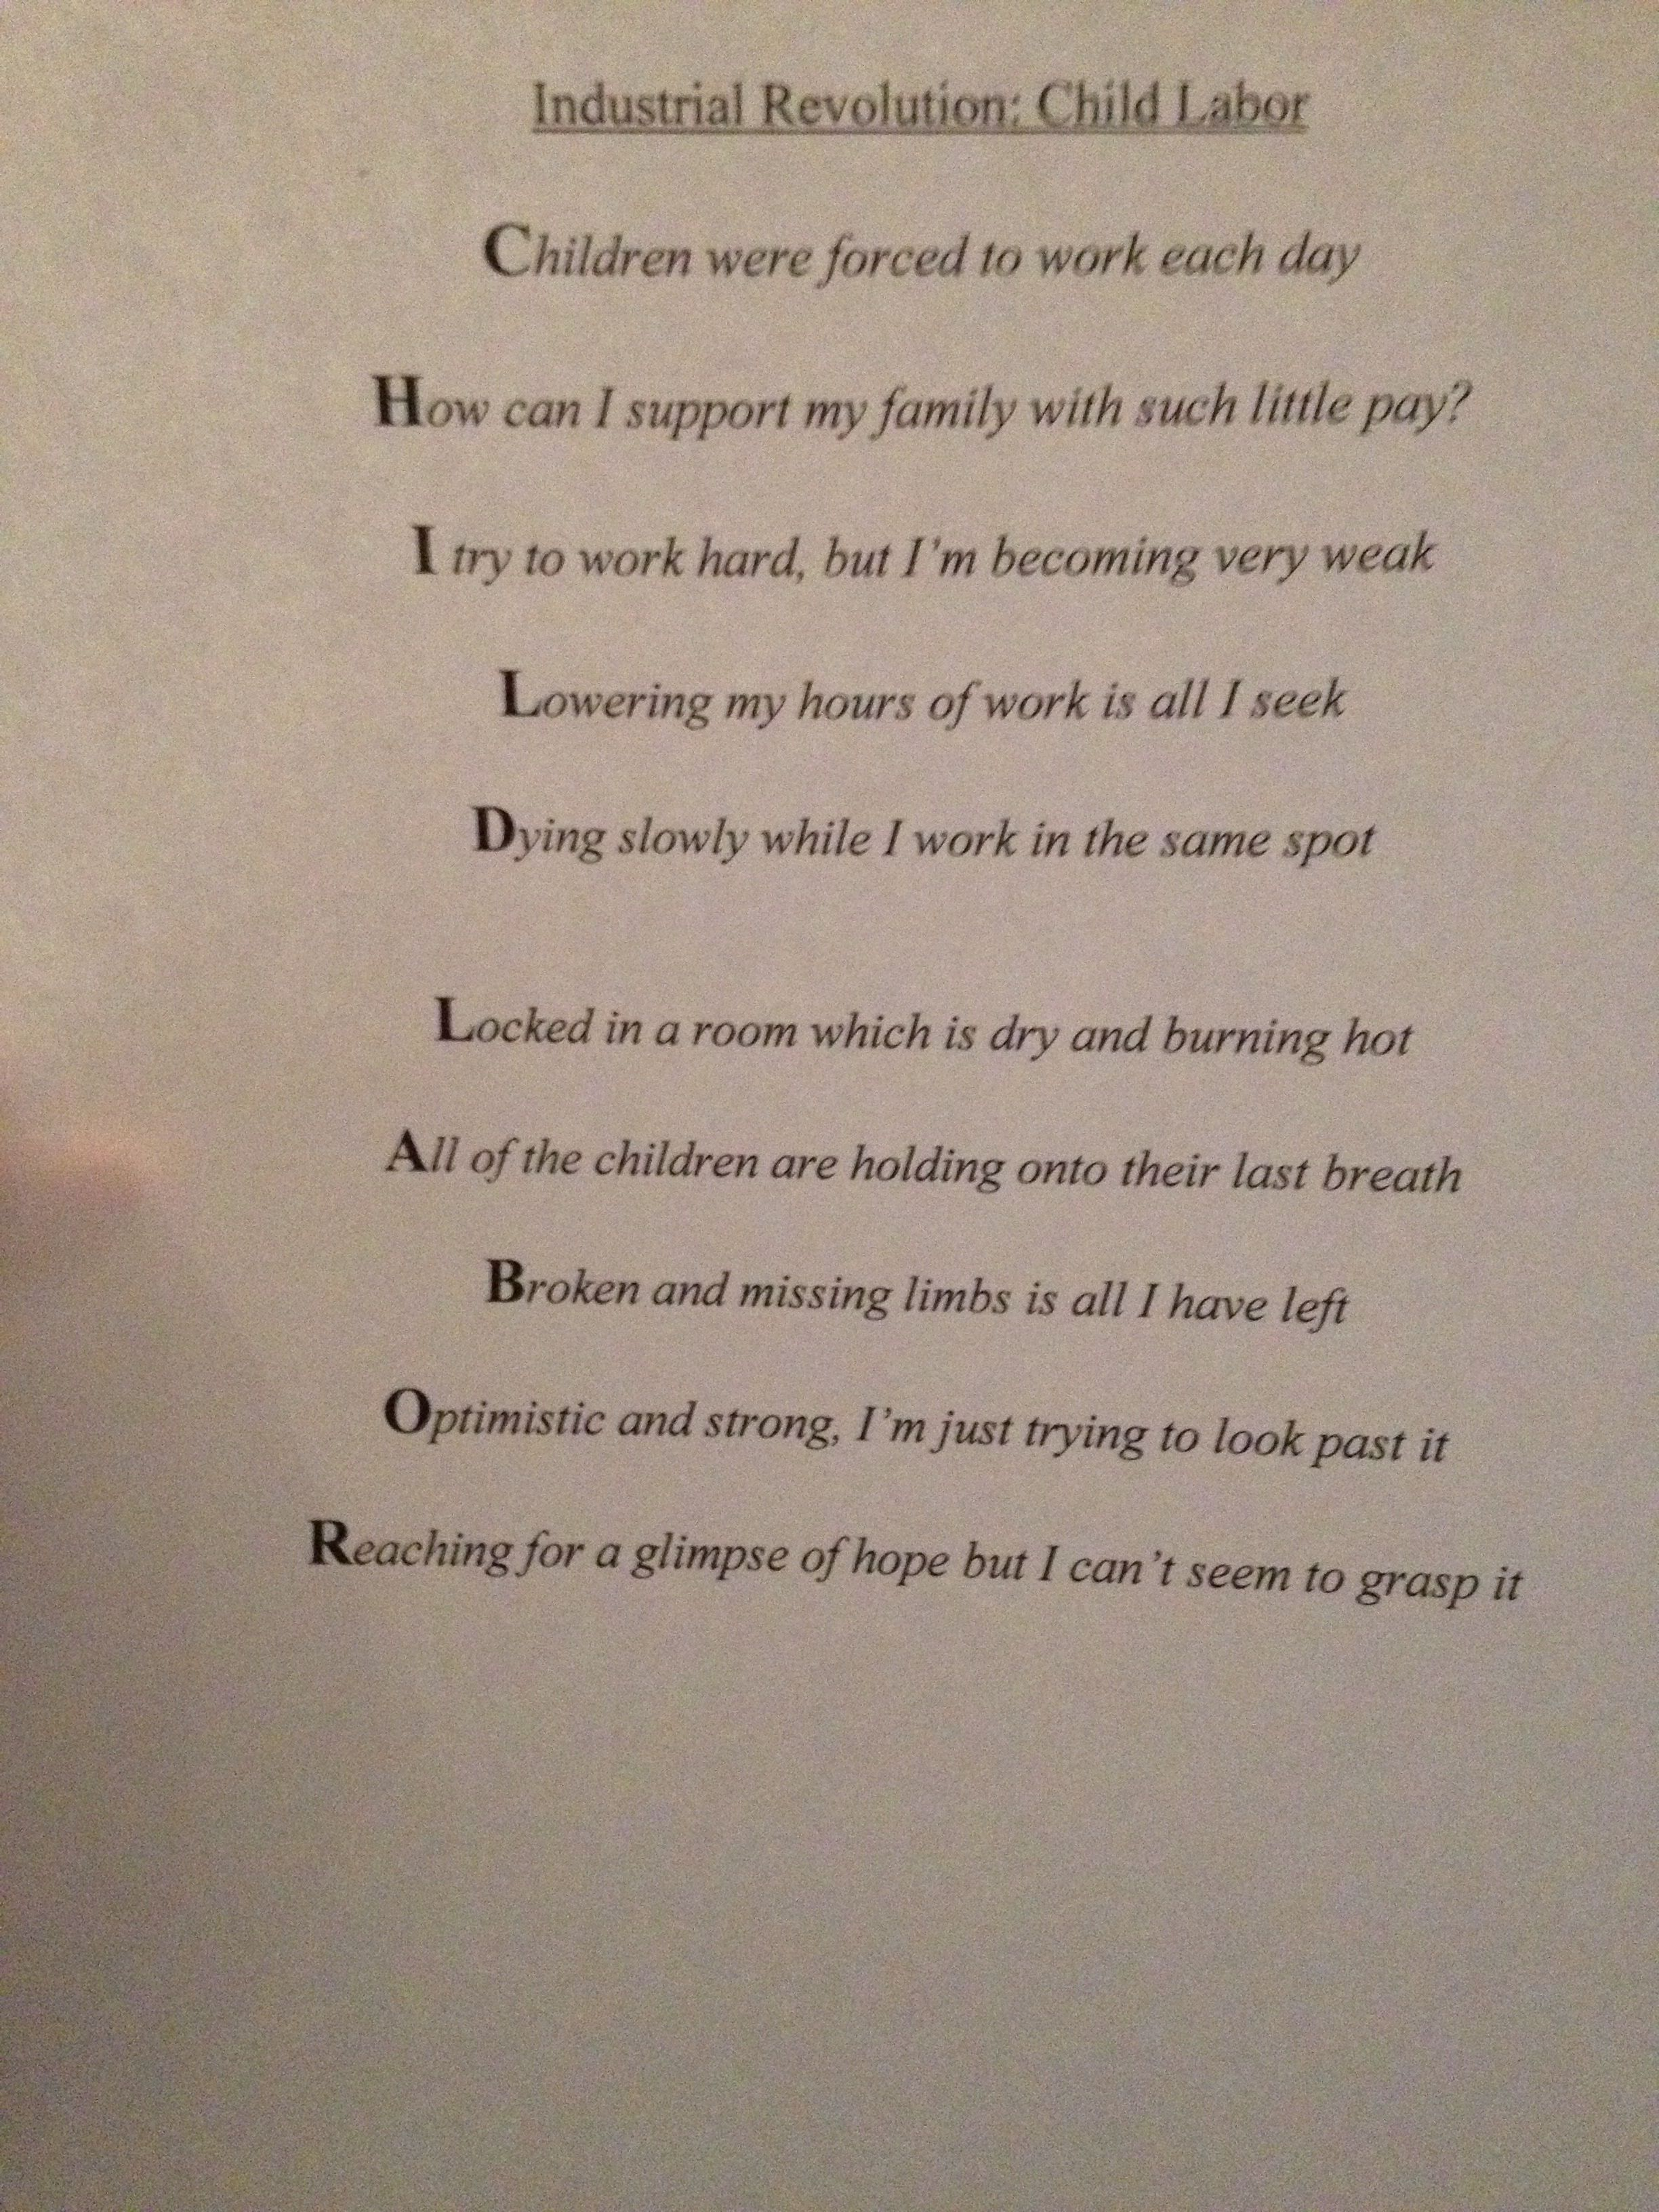 Industrial Revolution Child Labor Acronym And Poem